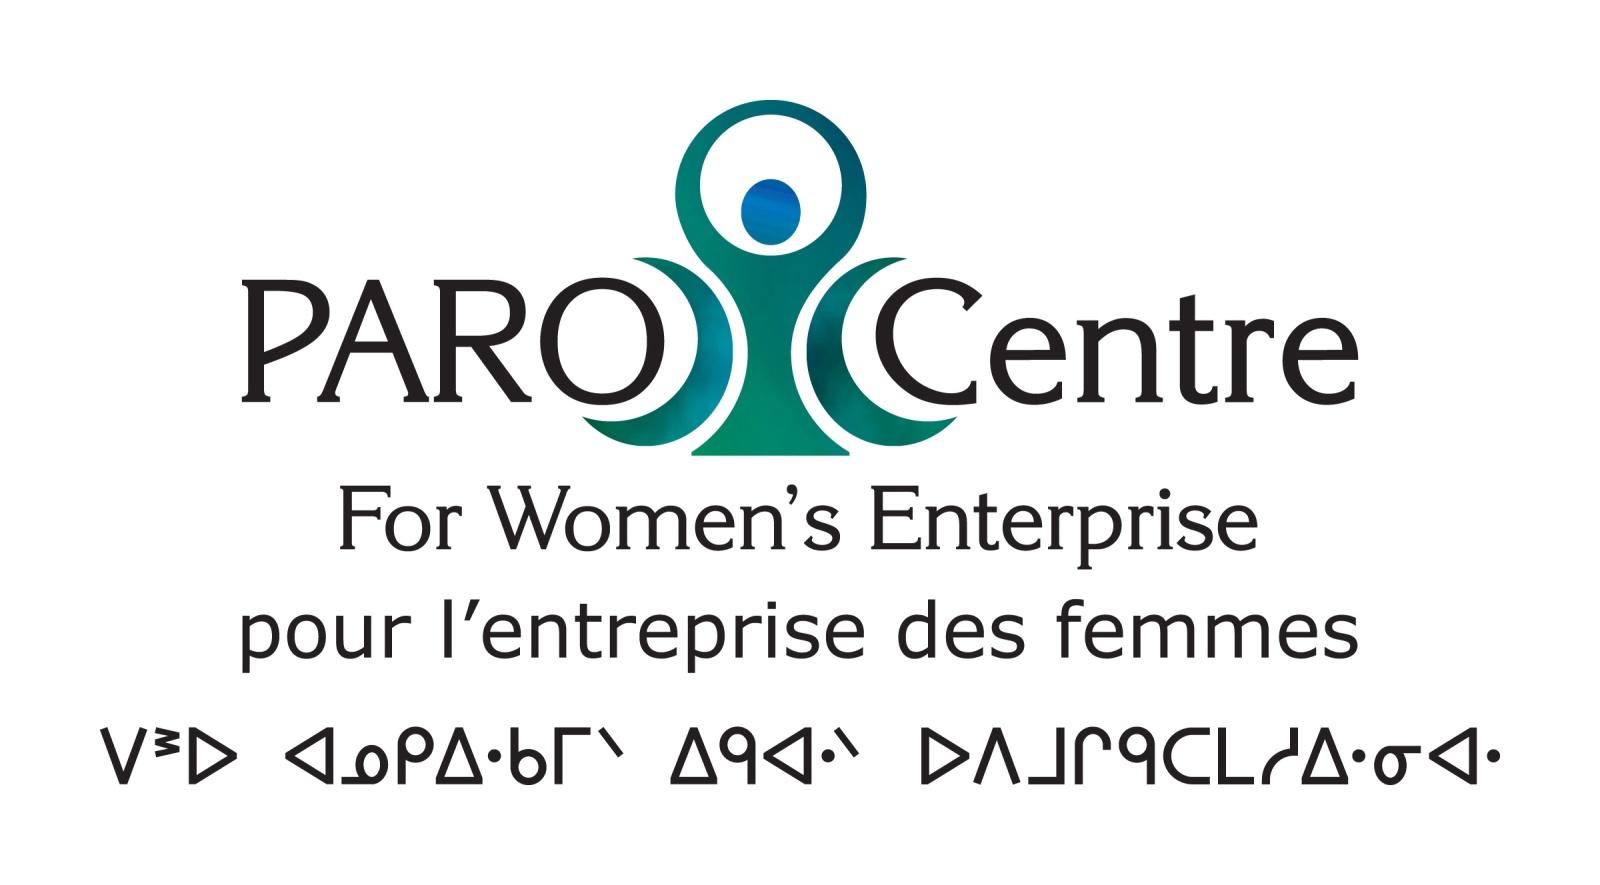 PARO Centre for Womens Enterprise